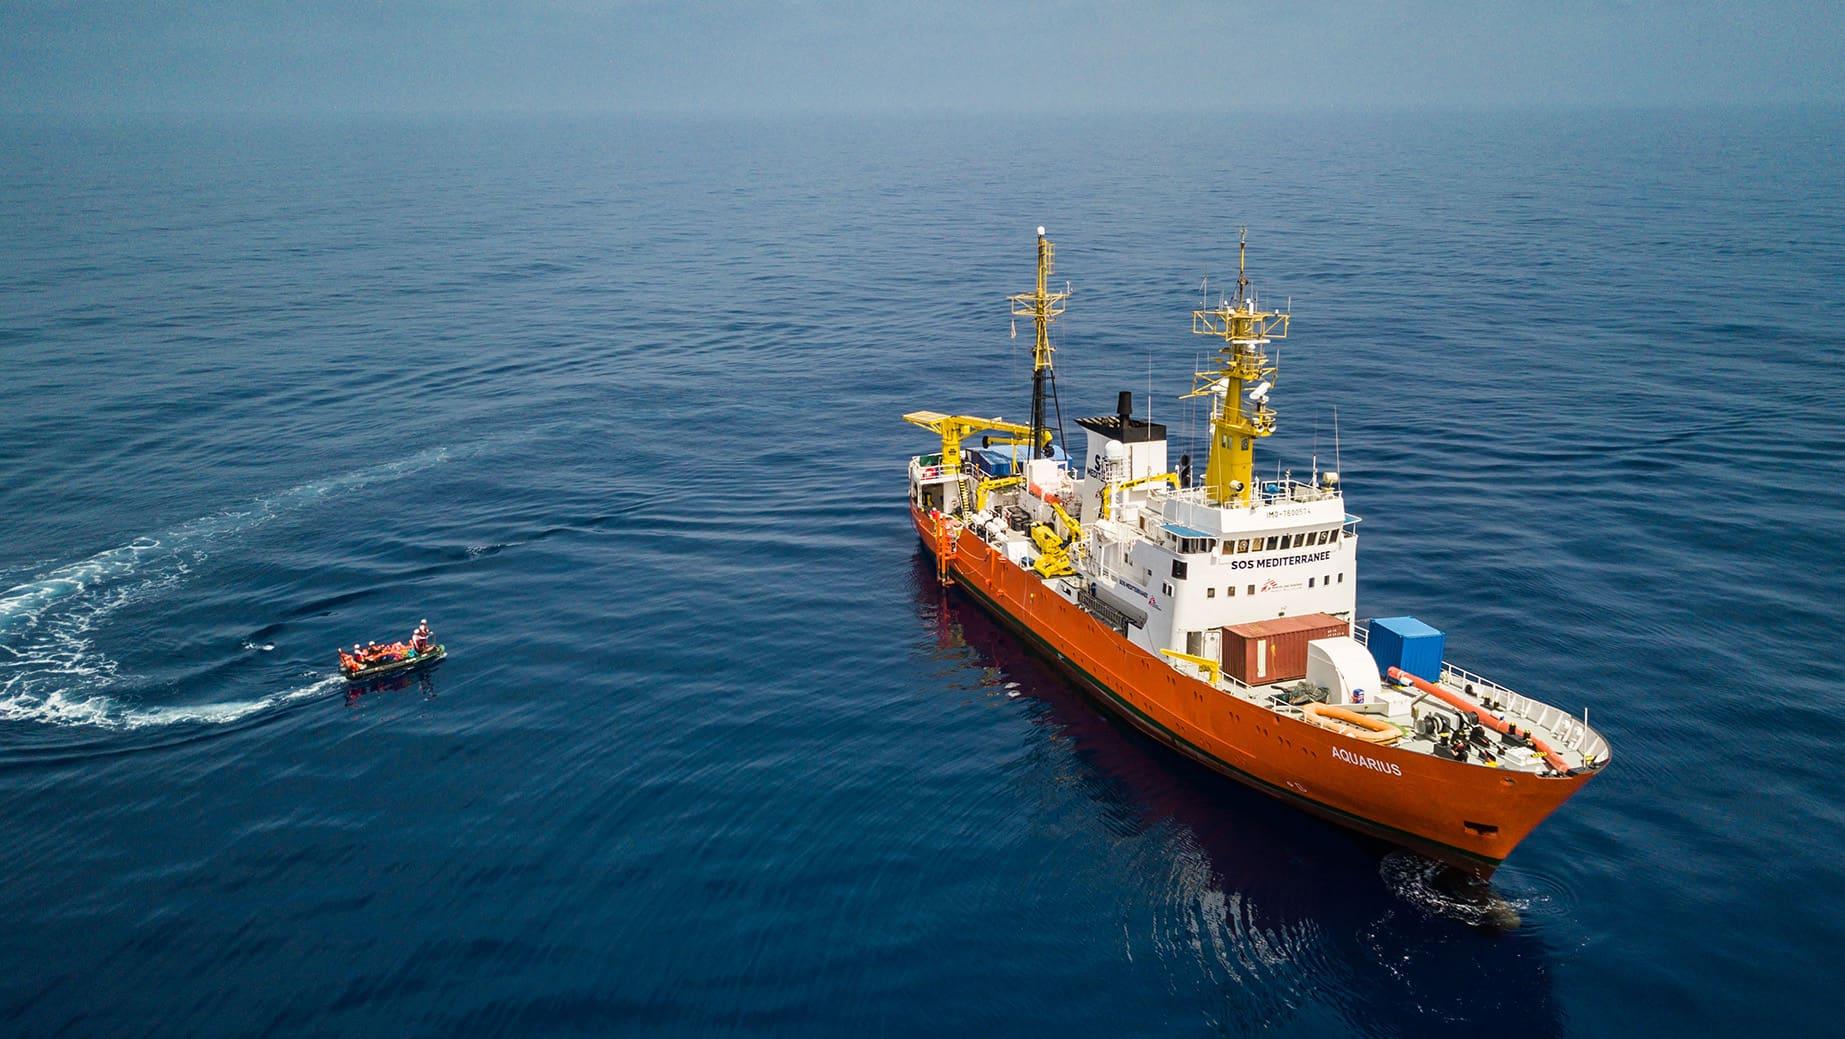 Aquarius -alus Libyan rannikolla pelastustoimissa huhtikuussa 2018.